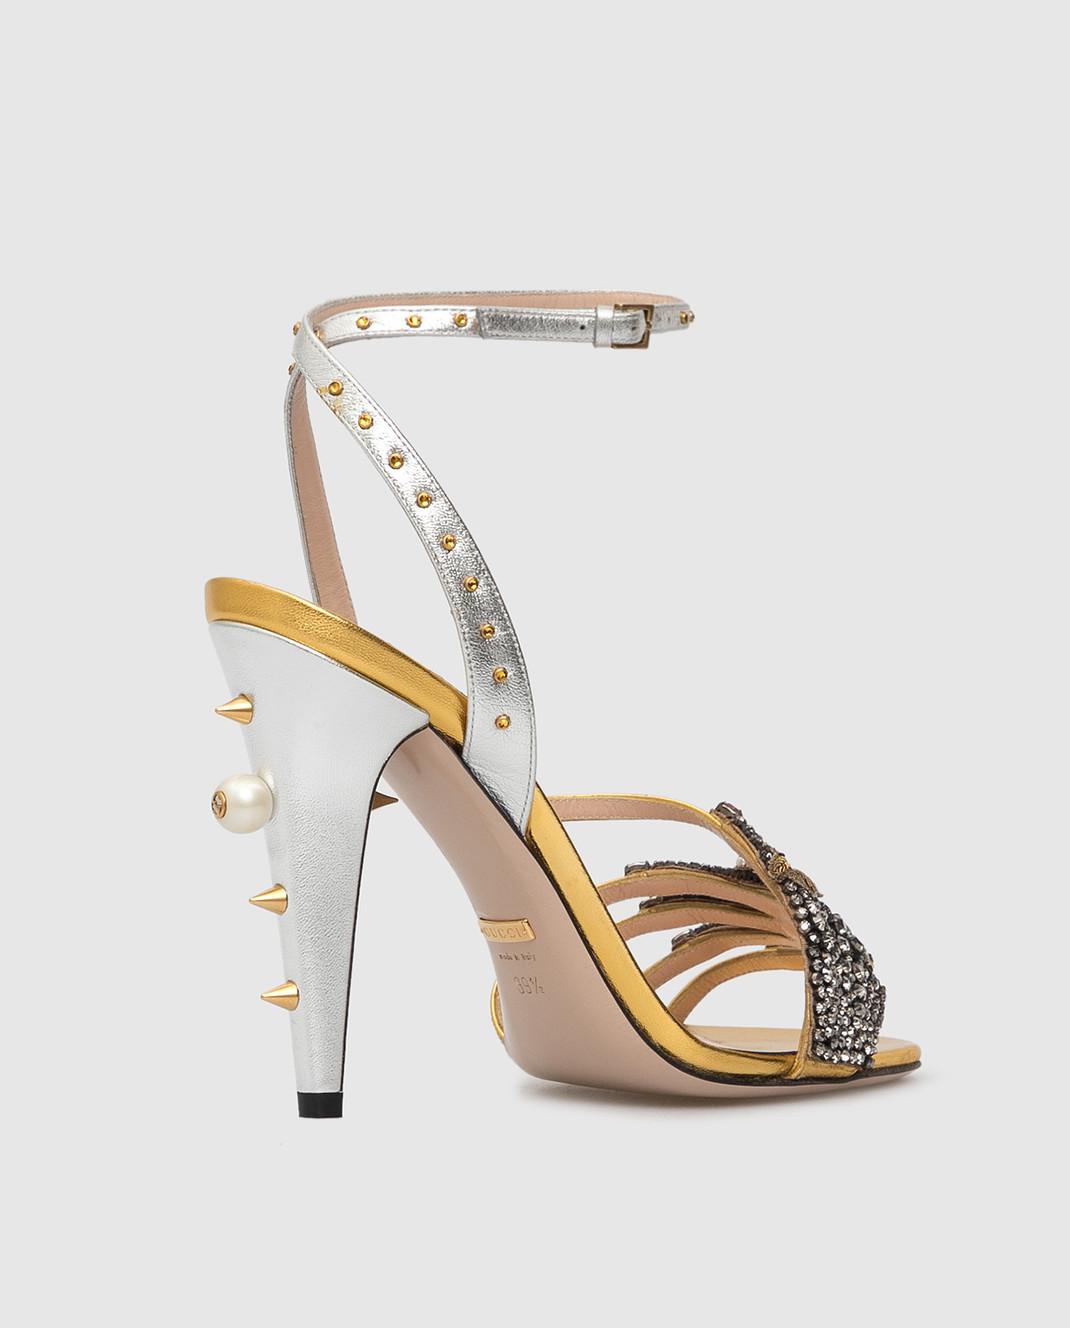 Gucci Босоножки с кристаллами 452770 изображение 4